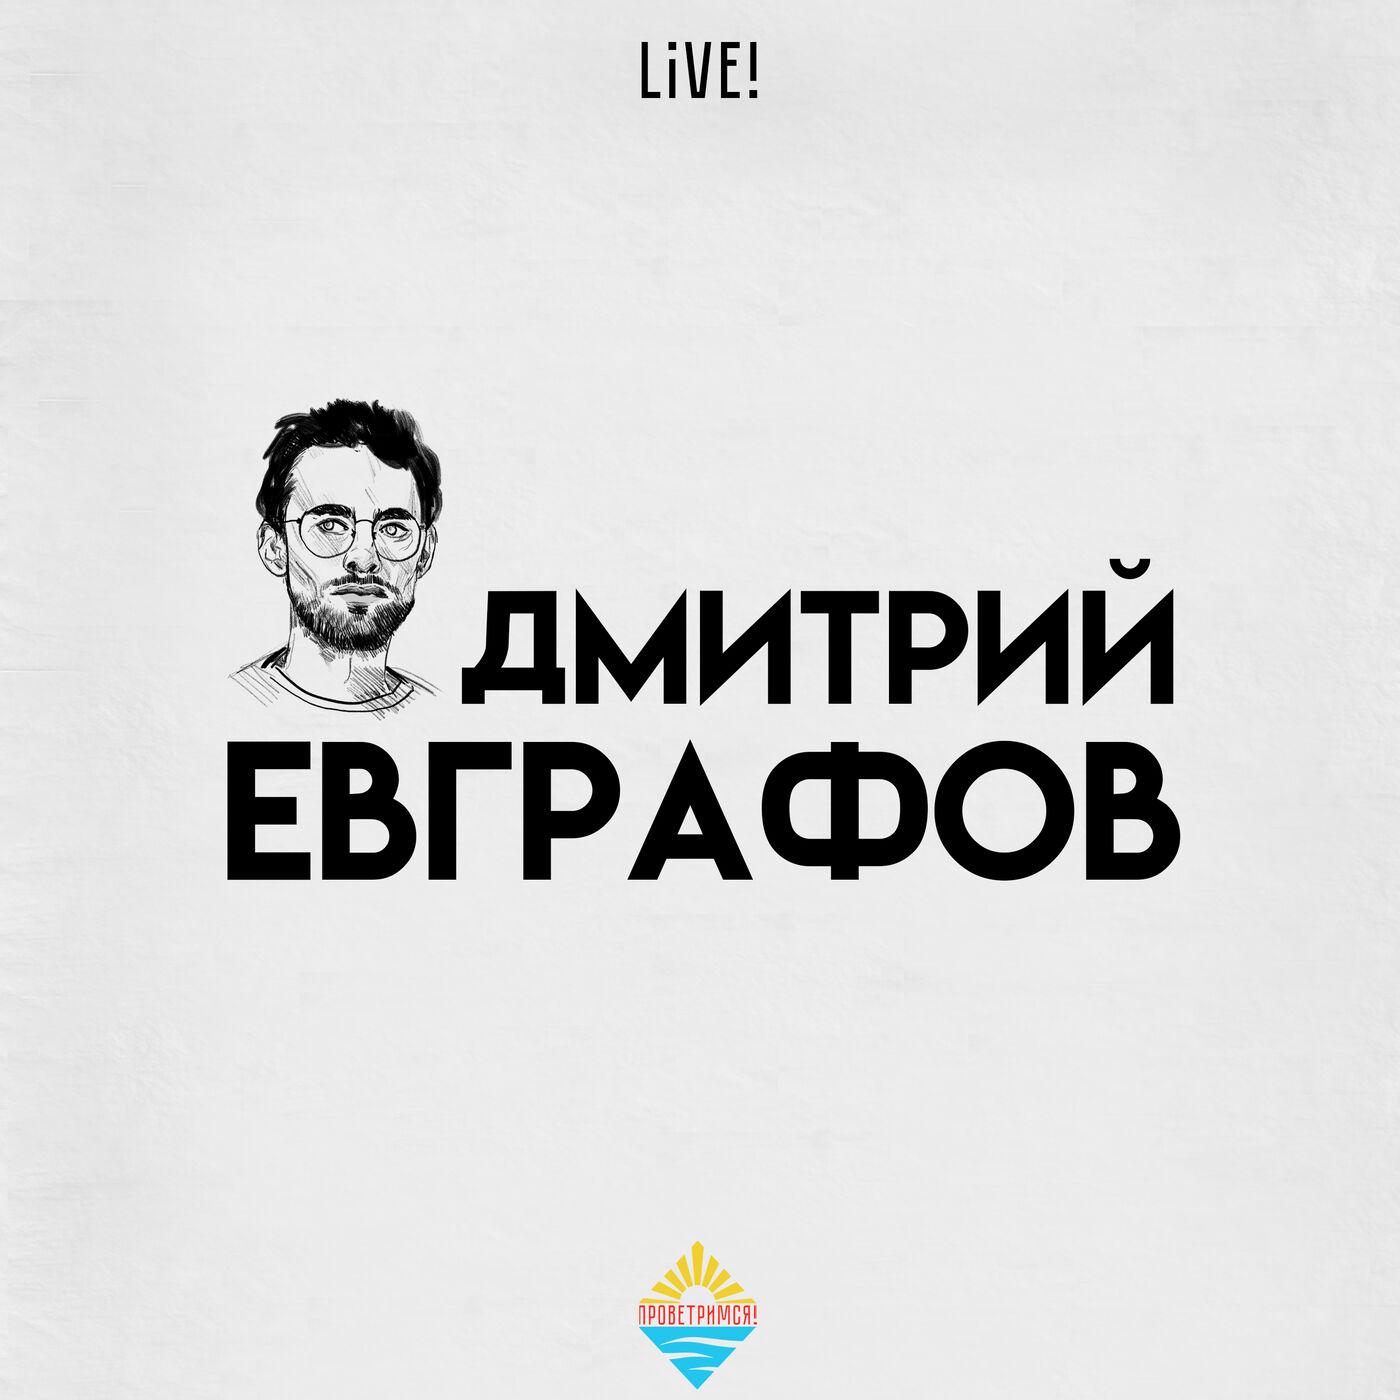 Дмитрий Еврафов live!